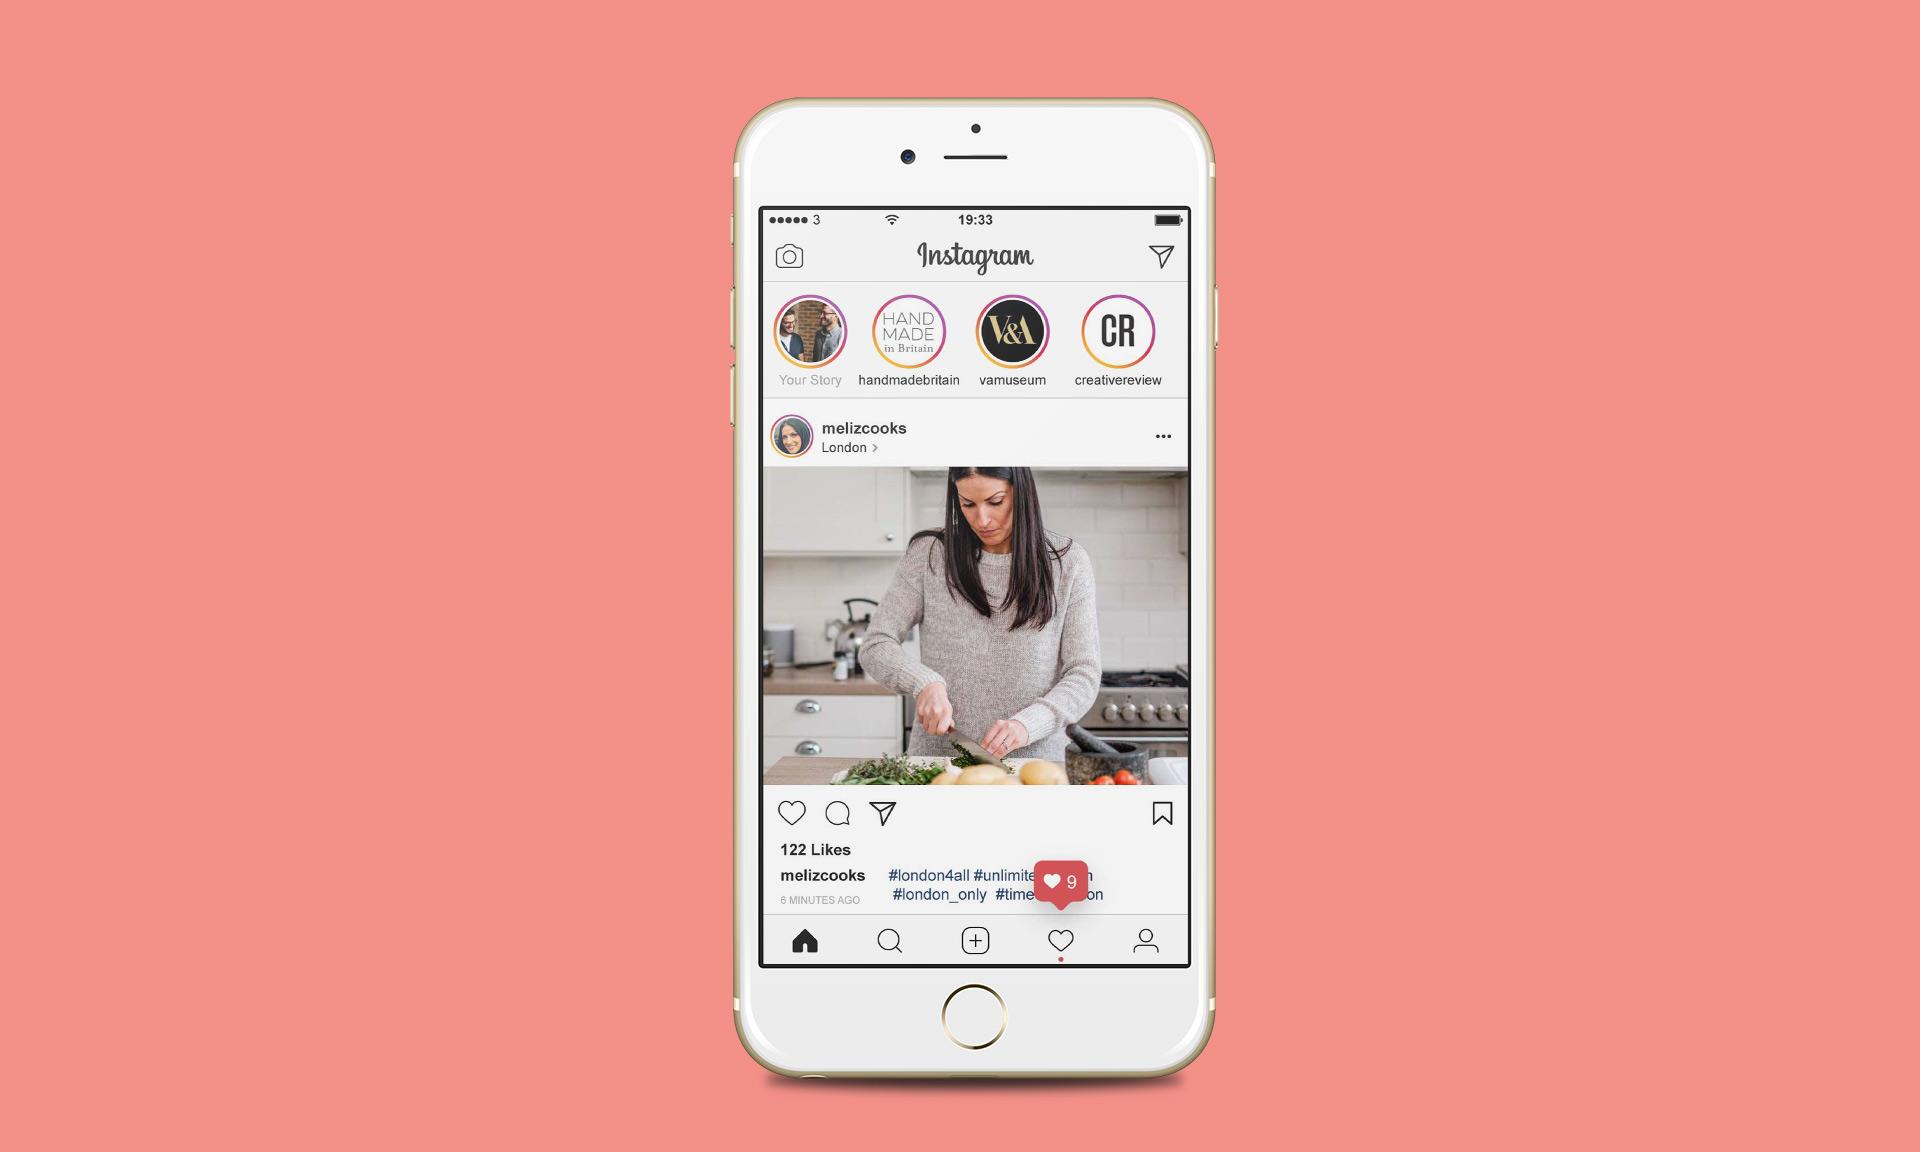 Meliz Cooks Instagram